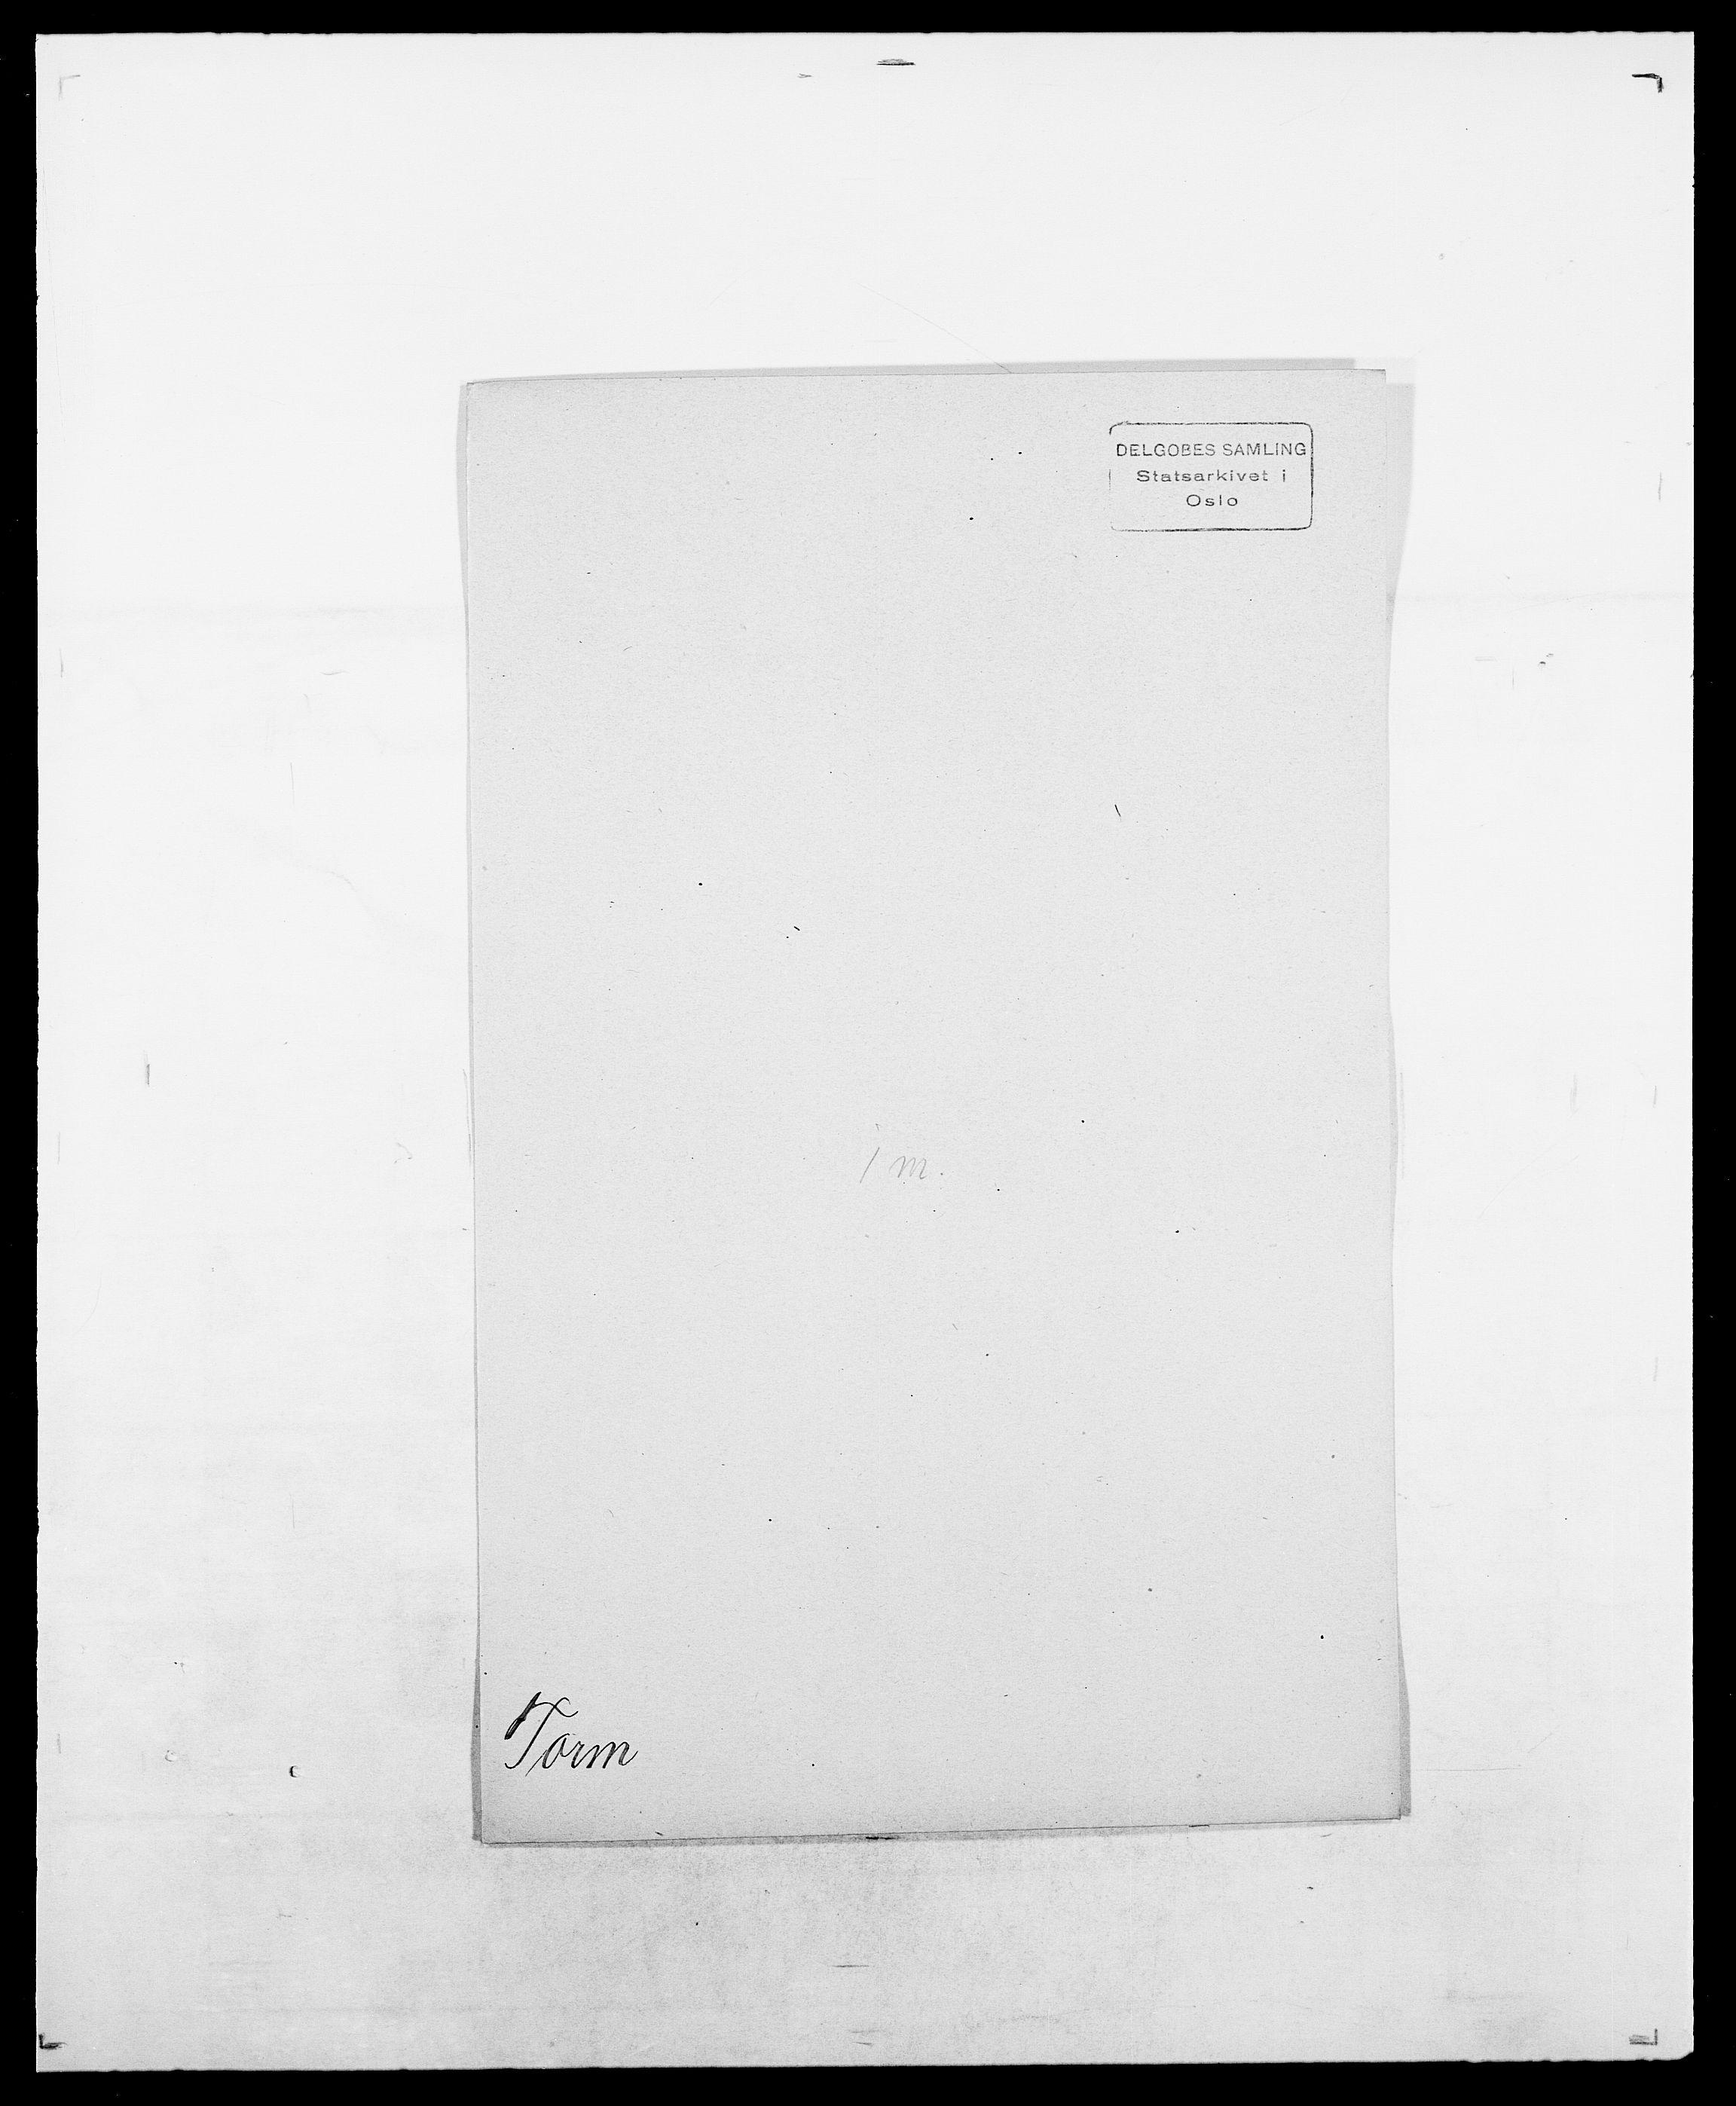 SAO, Delgobe, Charles Antoine - samling, D/Da/L0039: Thorsen - Urup, s. 177